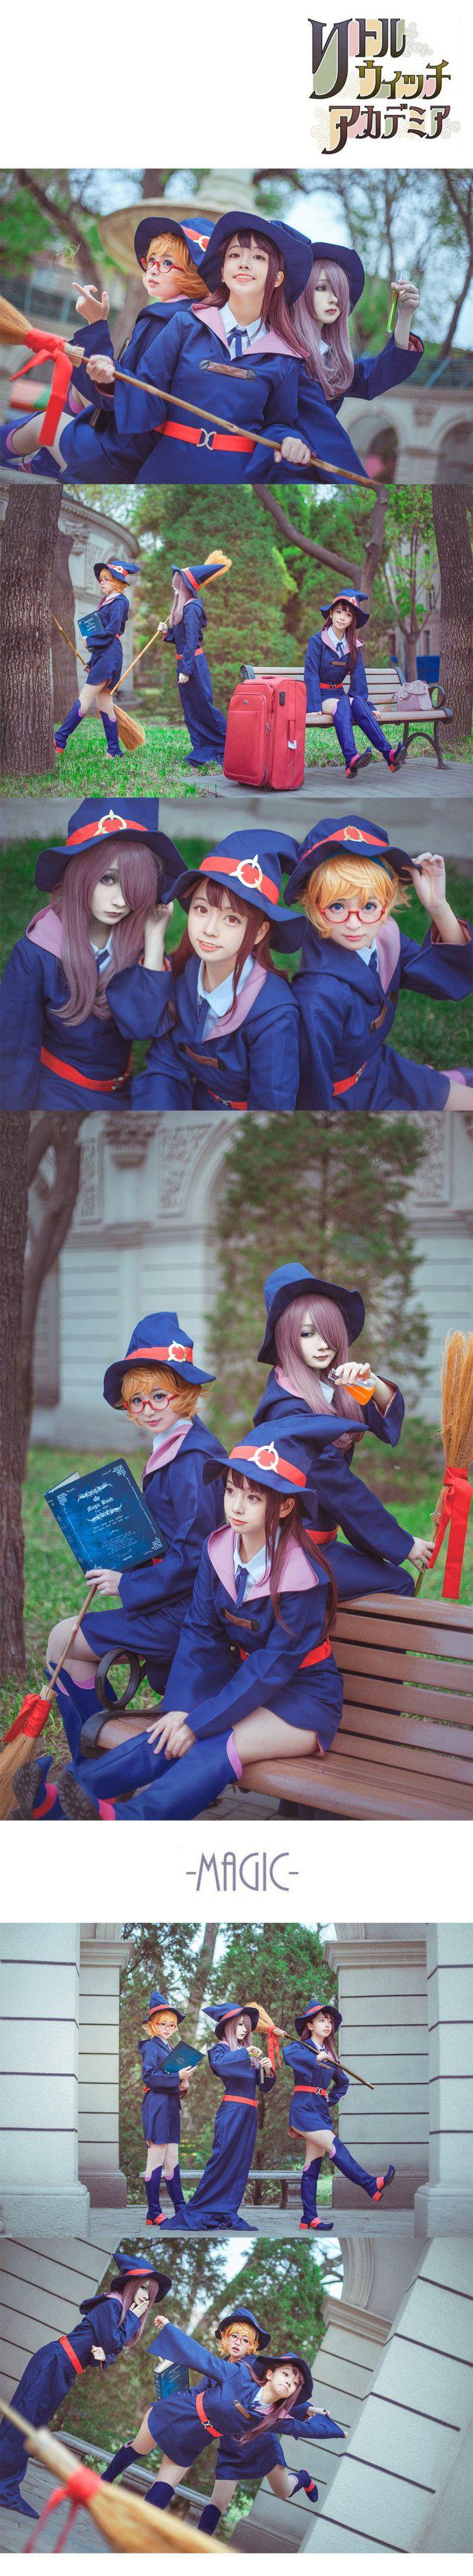 [Cosplay] Little Witch Academia Trio - Album on Imgur